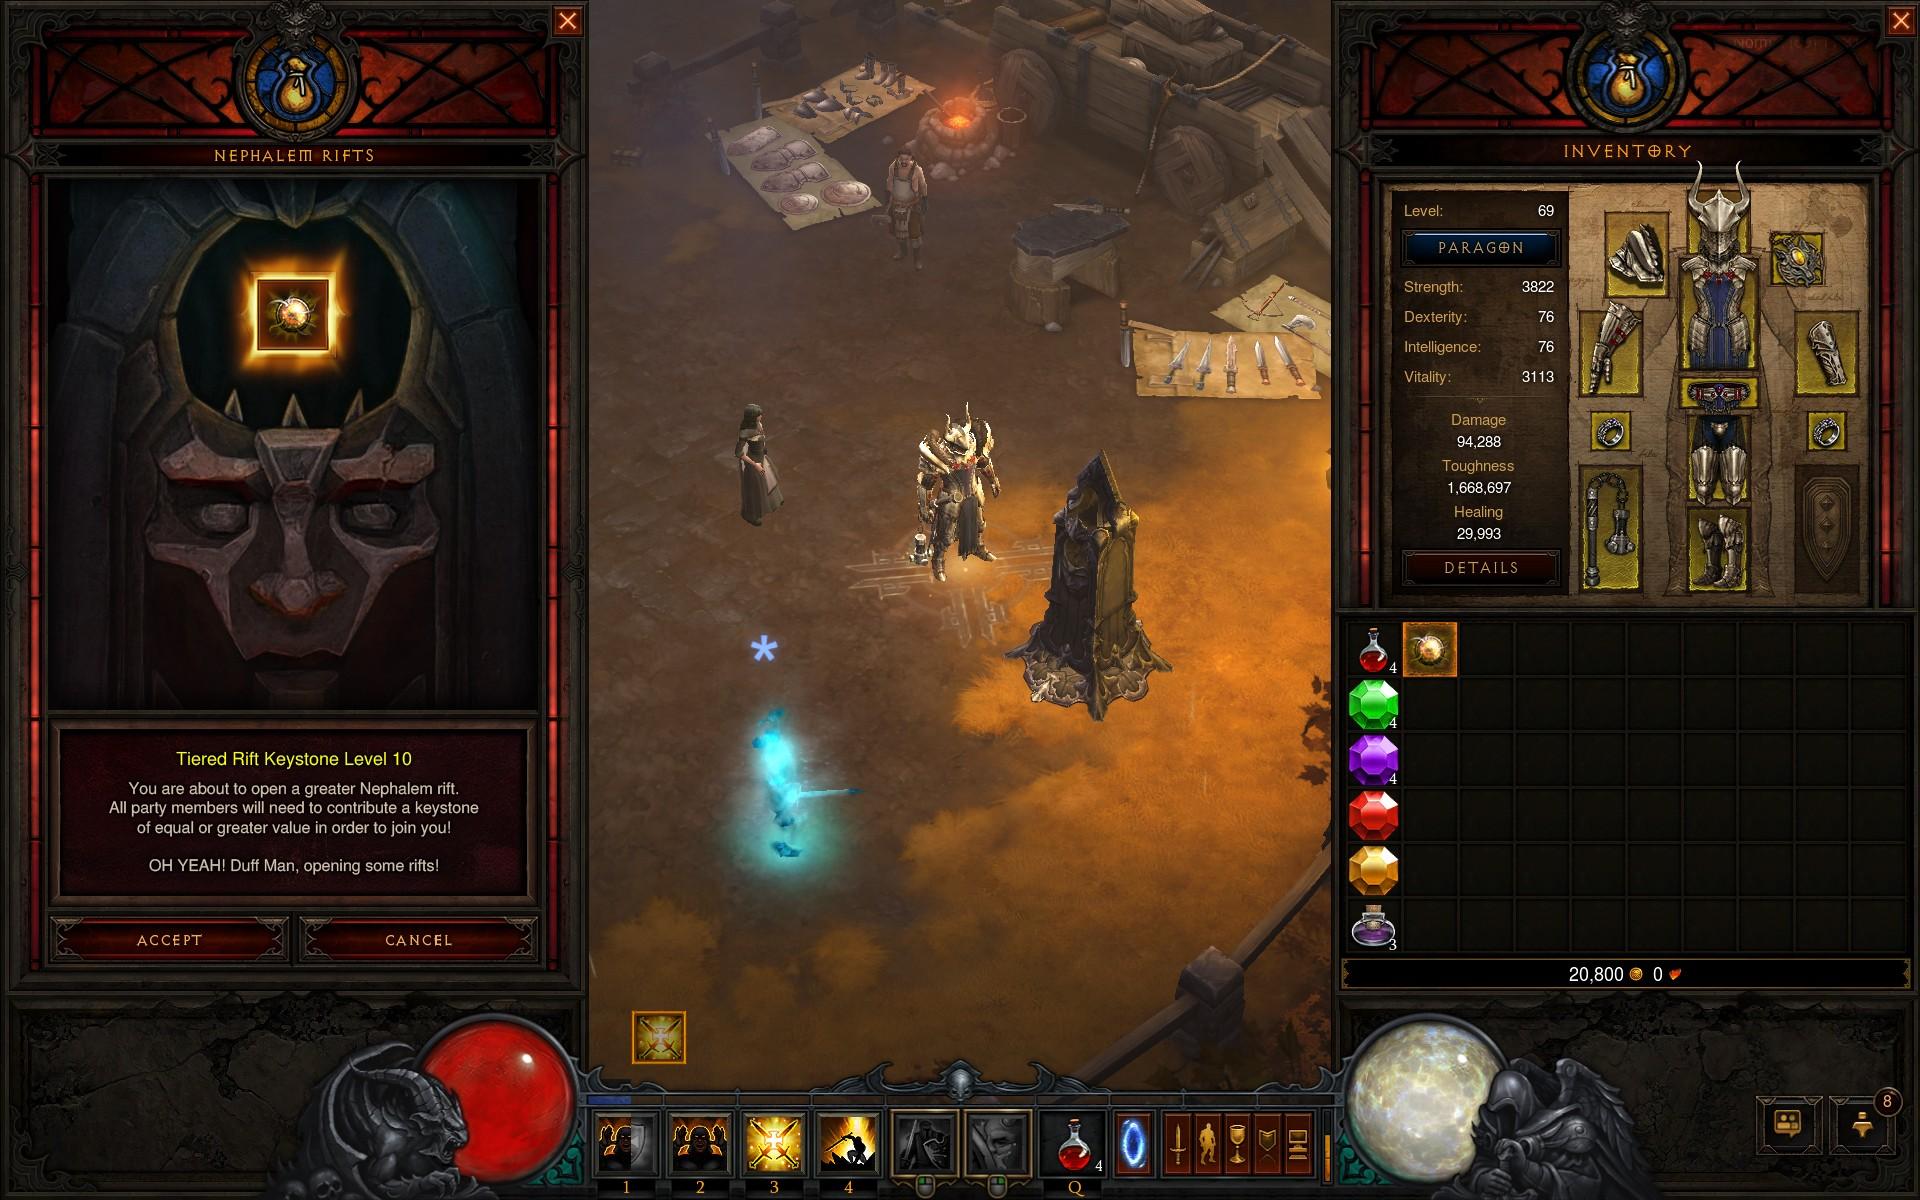 Diablo 3 naked run challenge requirements nudes video